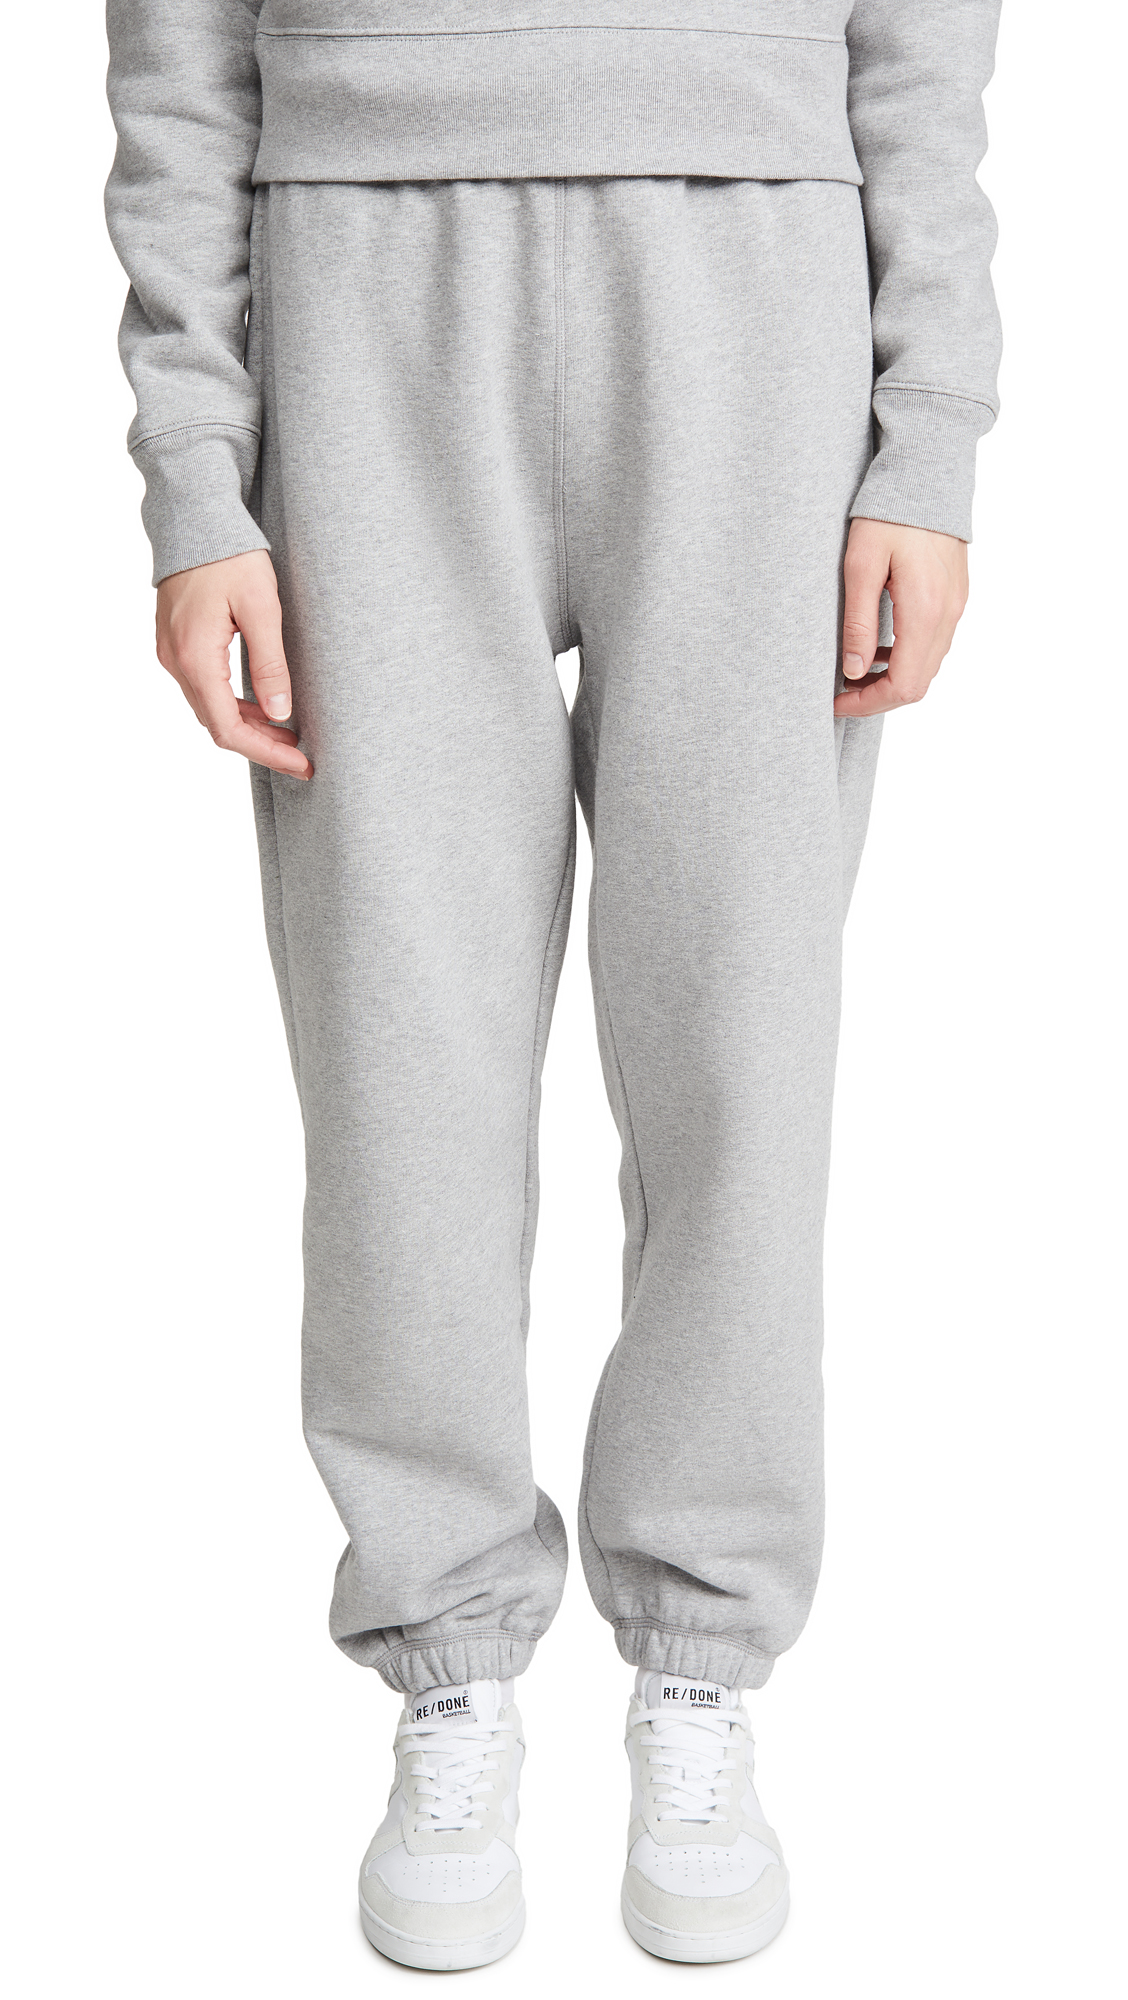 Reformation Classic Sweatpants